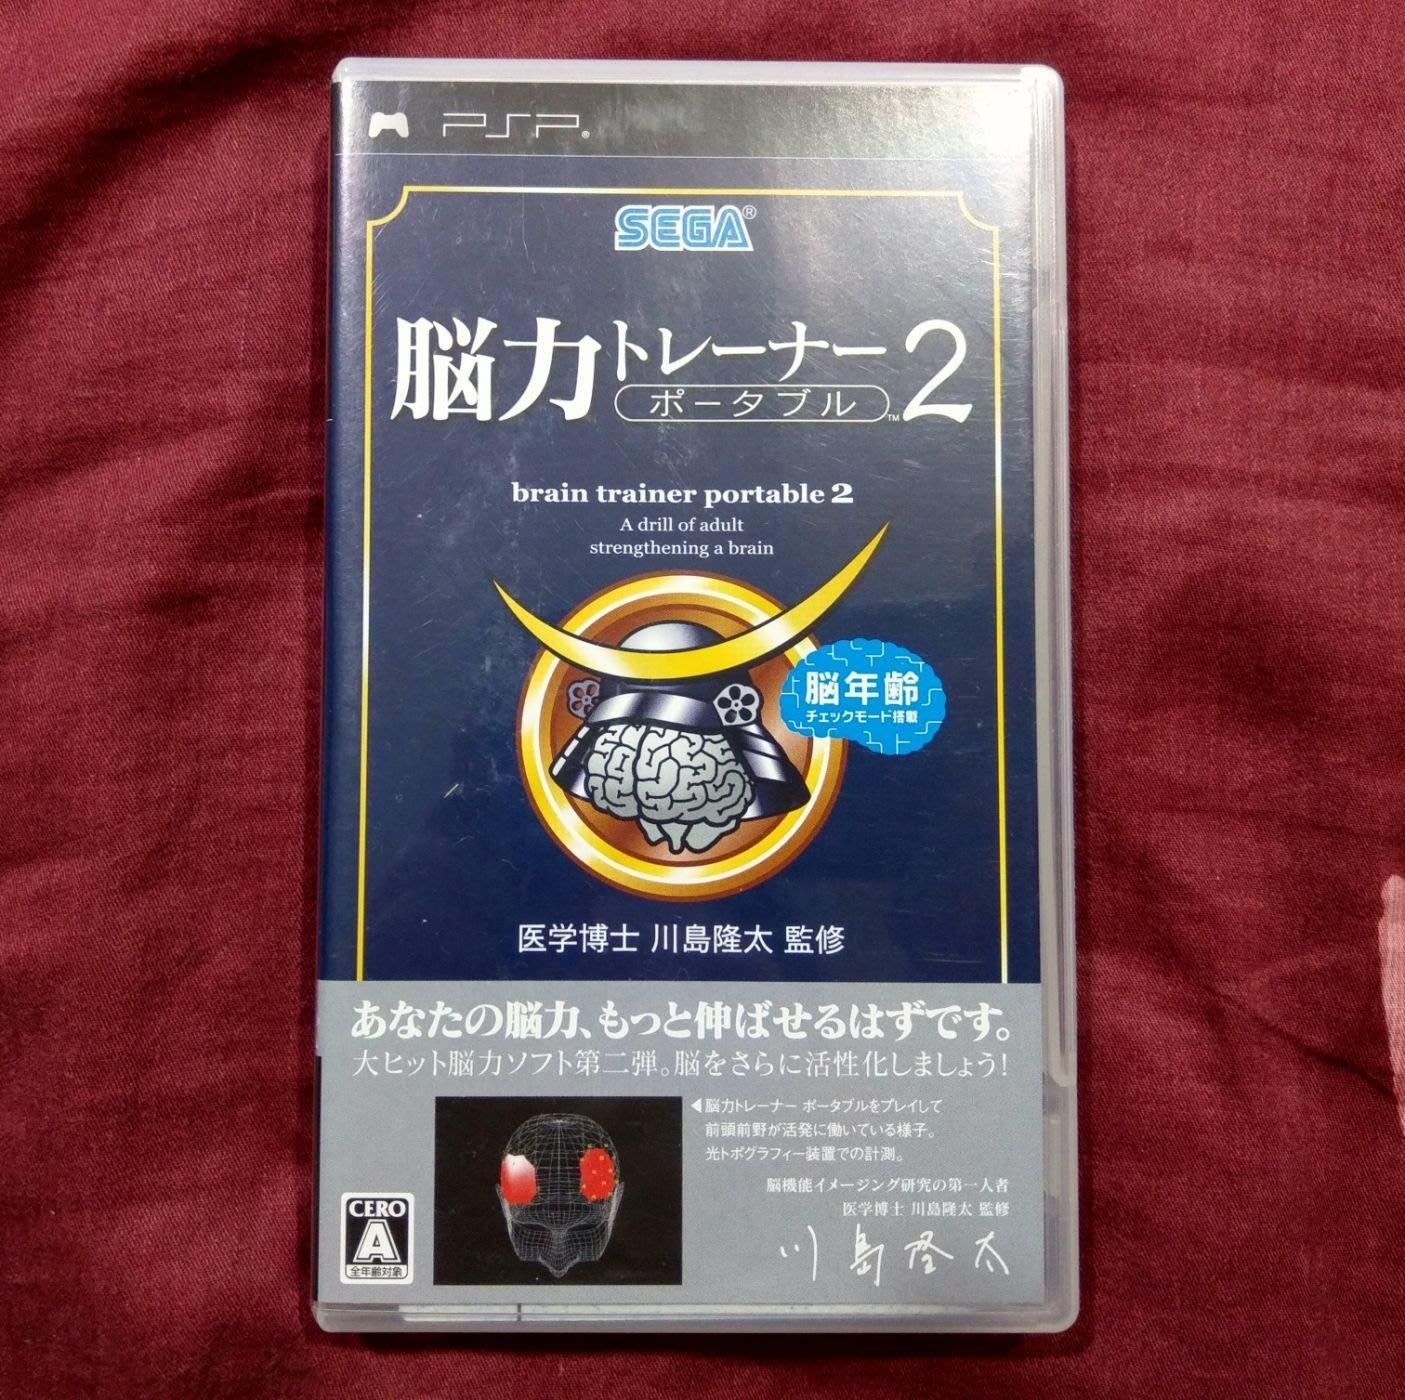 PSP 川島隆太教授監修 腦力訓練機2 (純日版) 純日版(編號257)